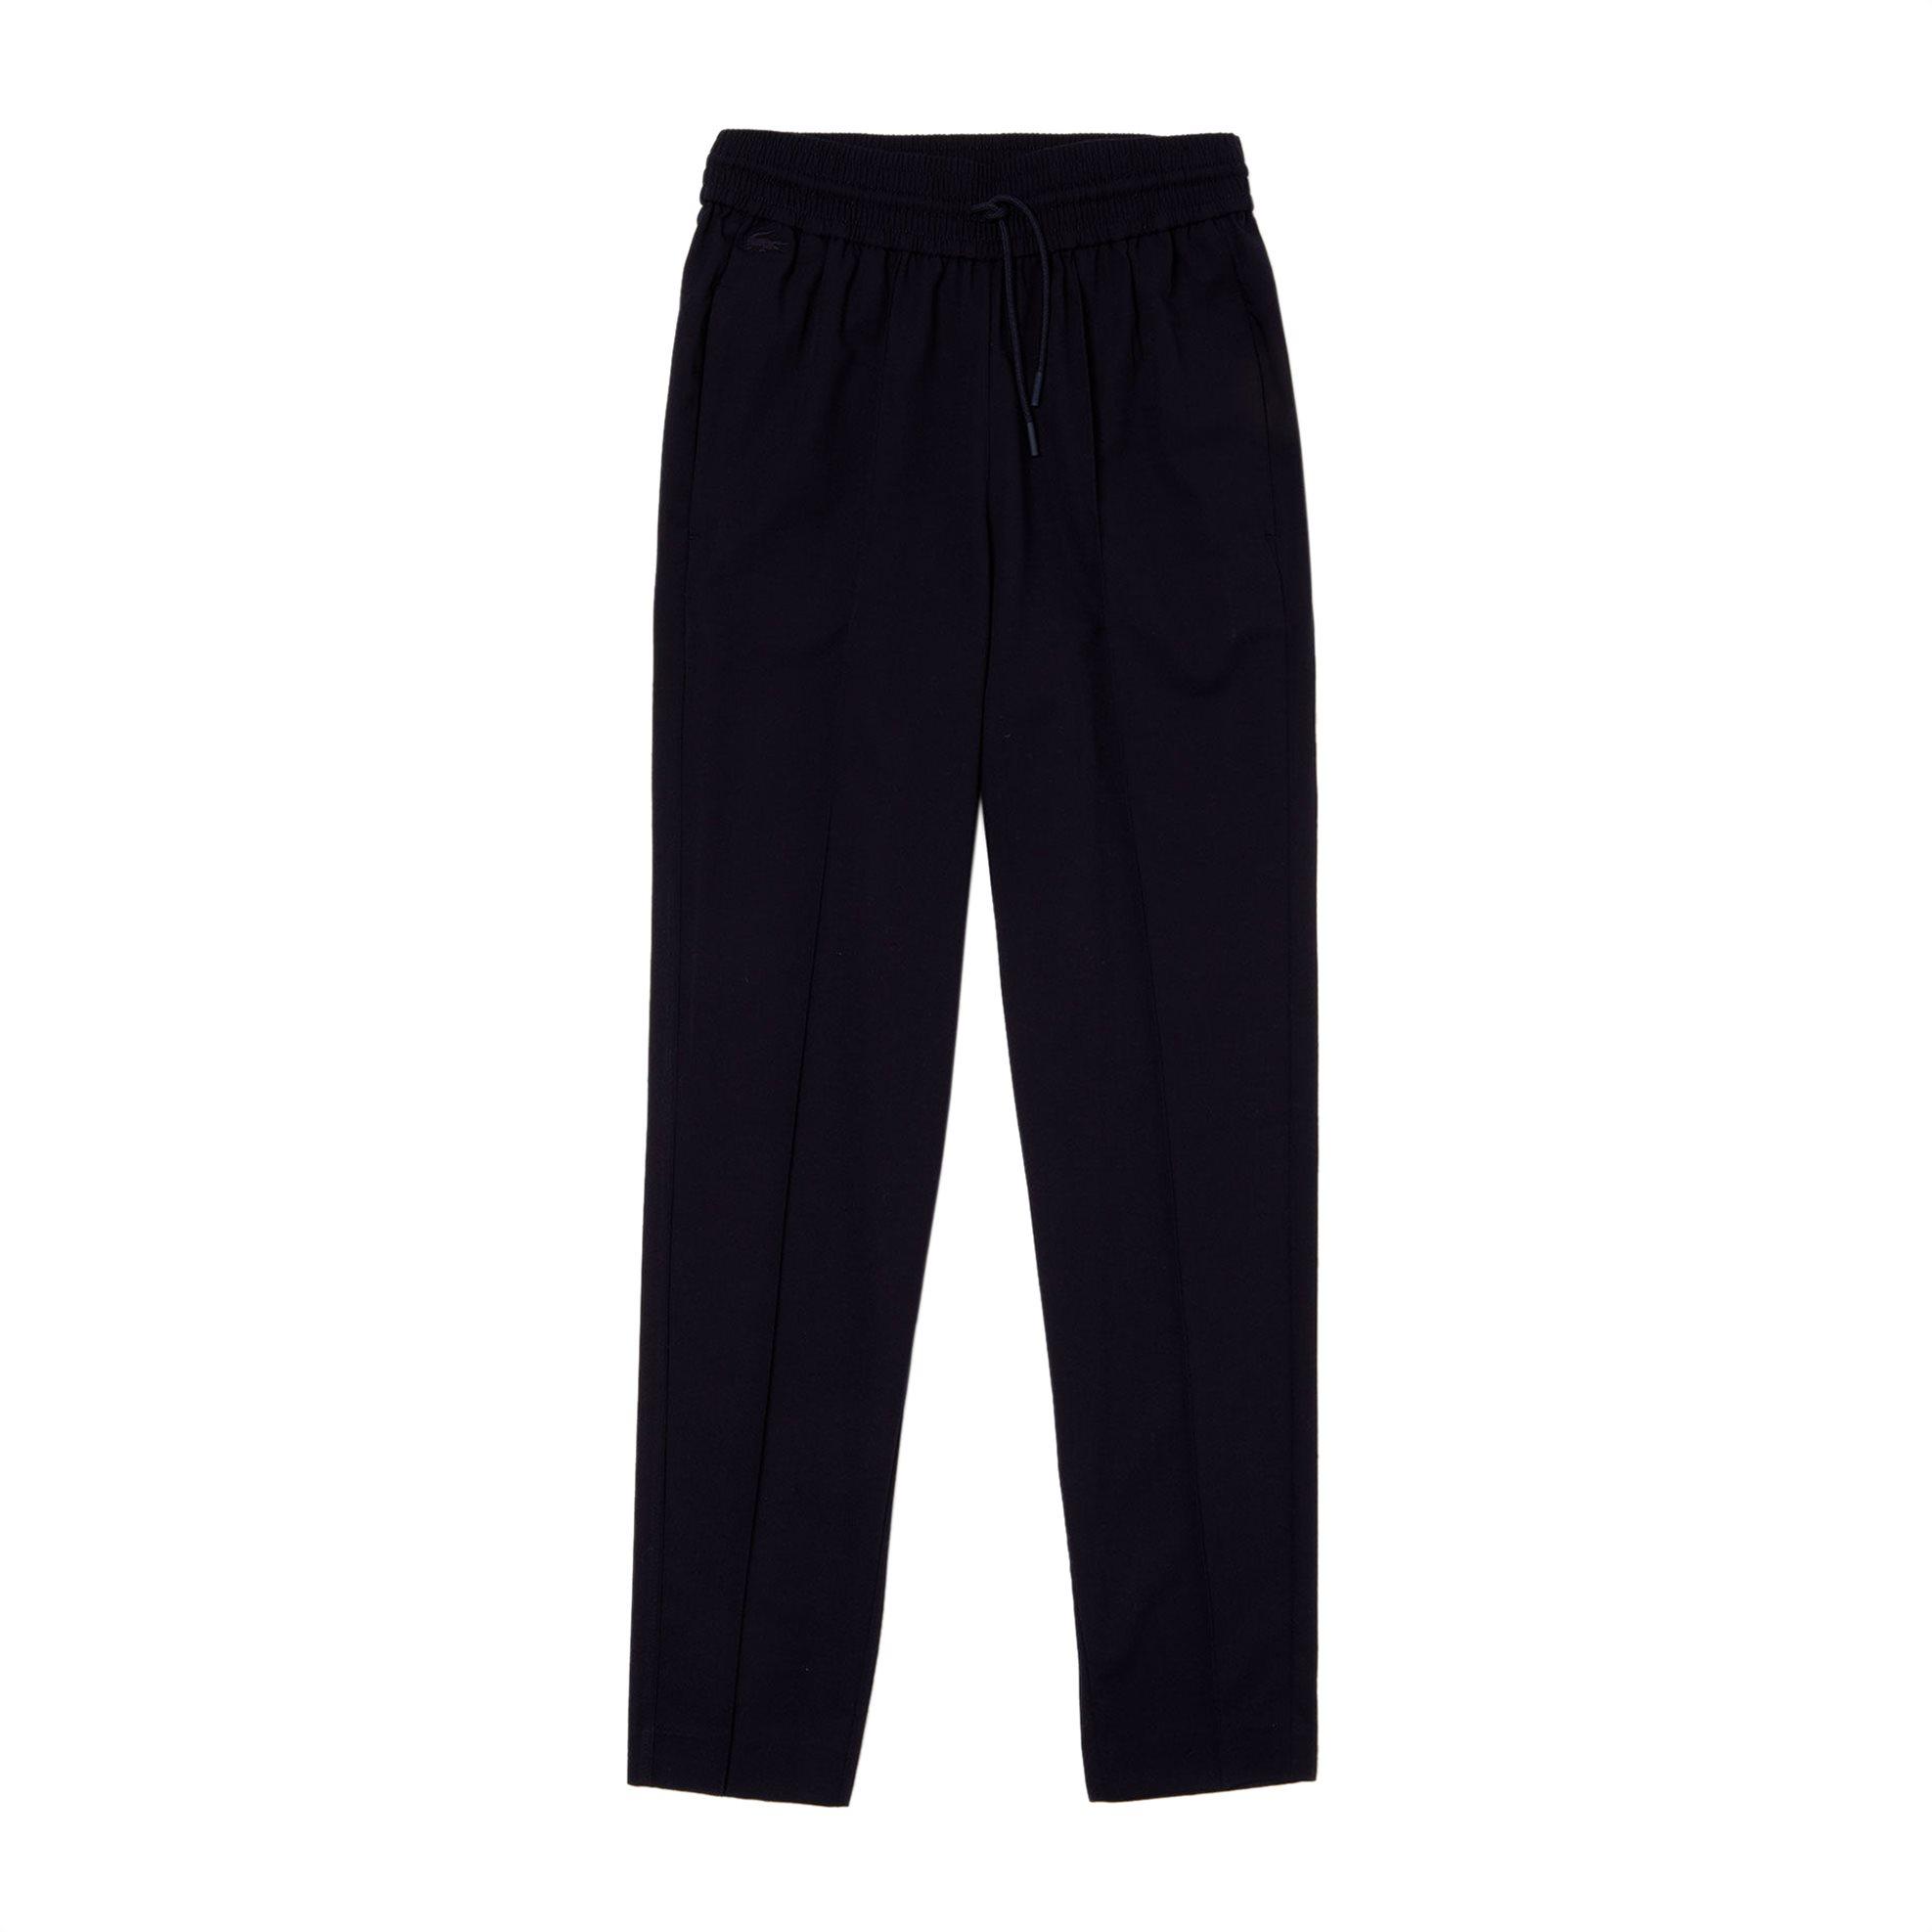 b1b180380ef Lacoste γυναικείο υφασμάτινο παντελόνι με λάστιχο στην μέση - HF4172 - Μπλε  Σκούρο